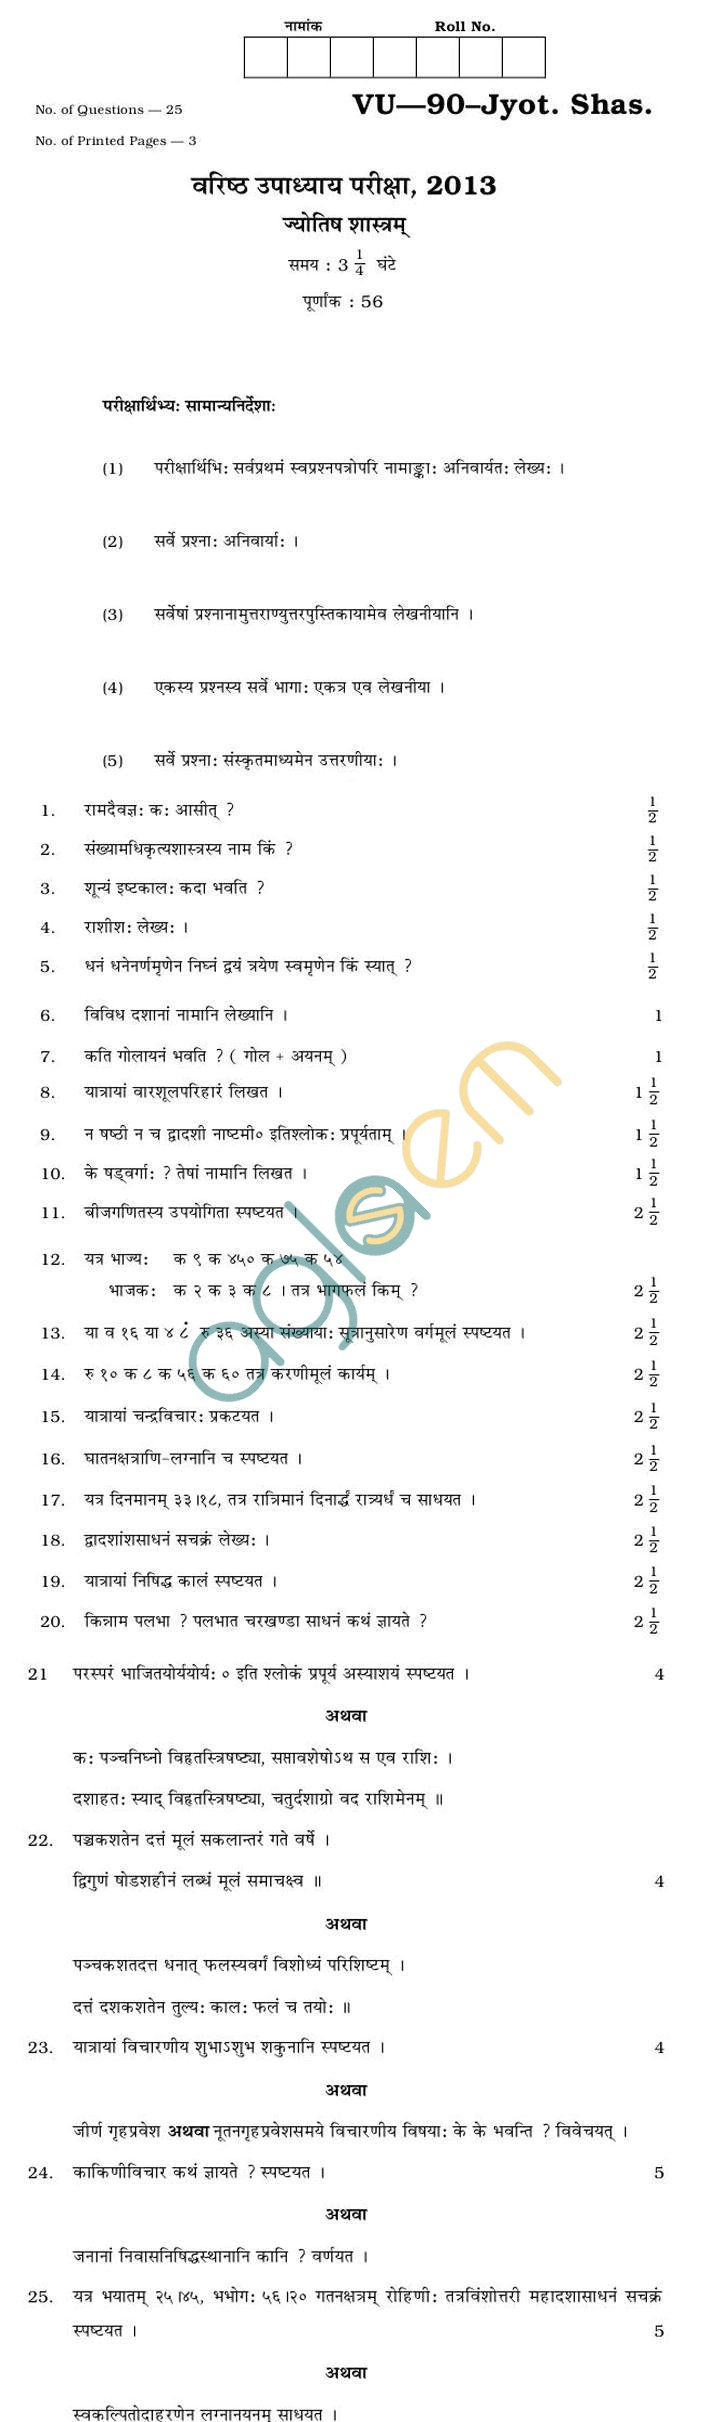 Rajasthan Board V Upadhyay Jyotish Shastram Question Paper 2013